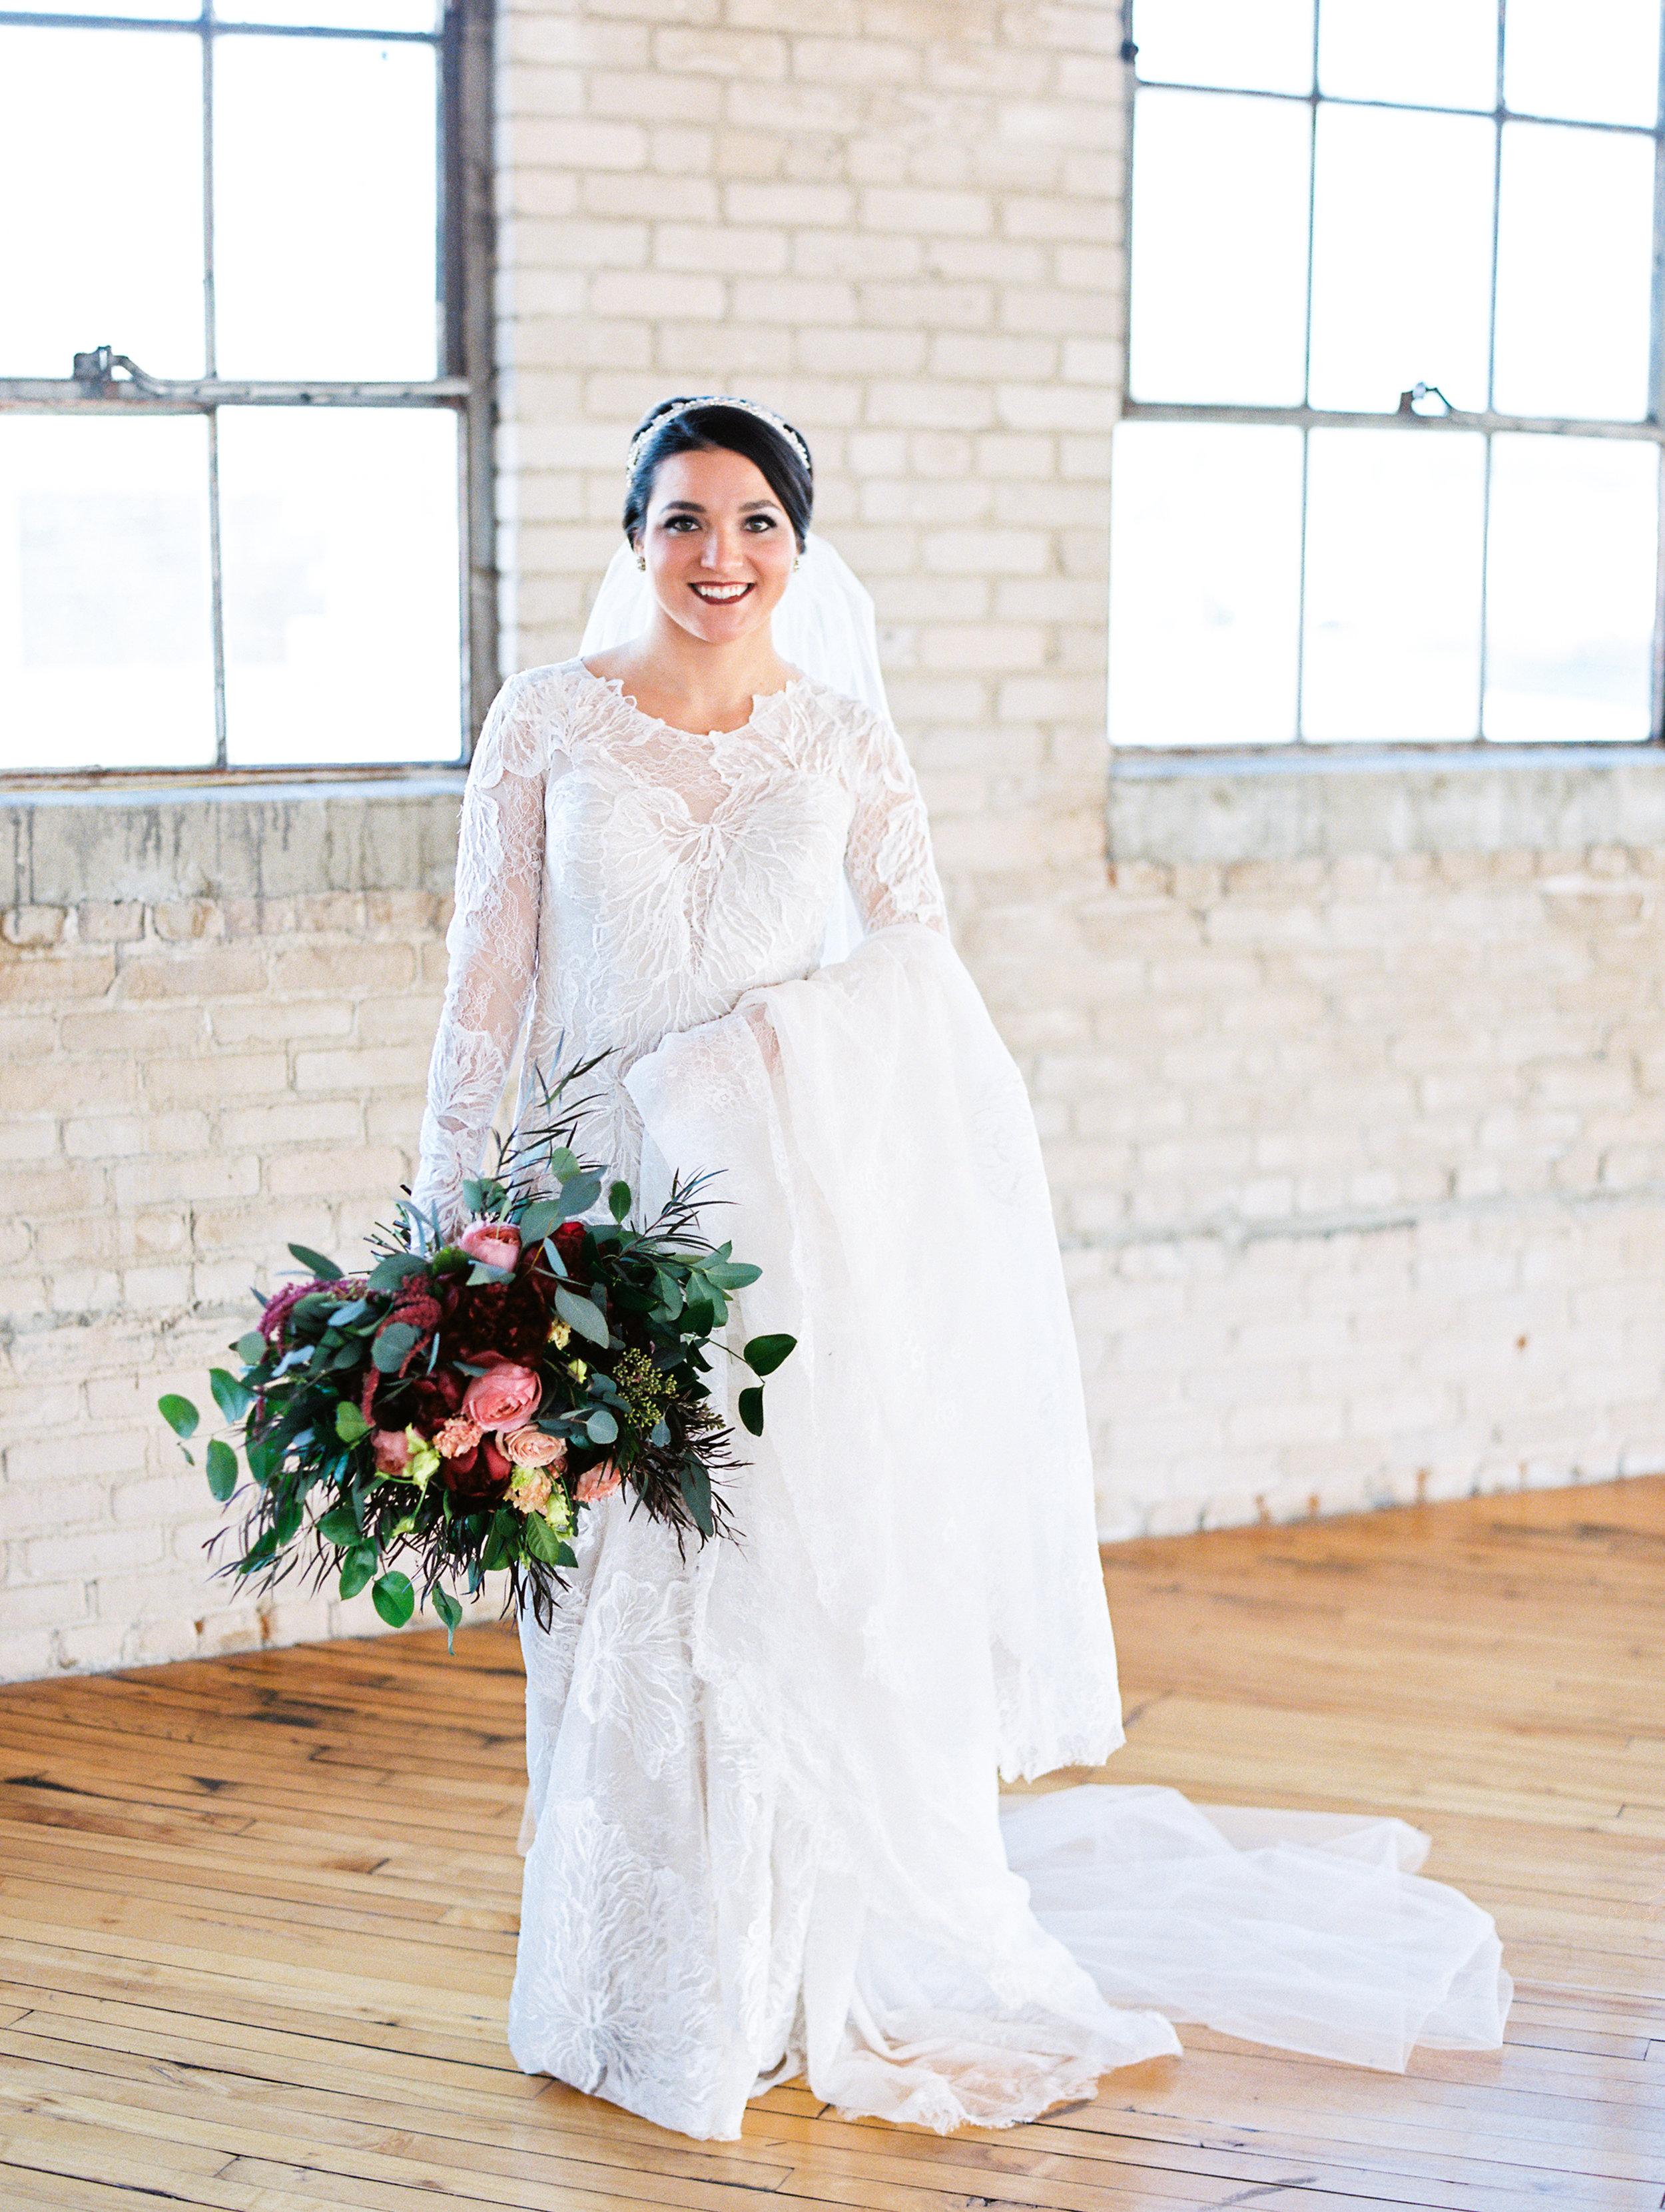 Vogelzang+Wedding+first+look+b-8.jpg